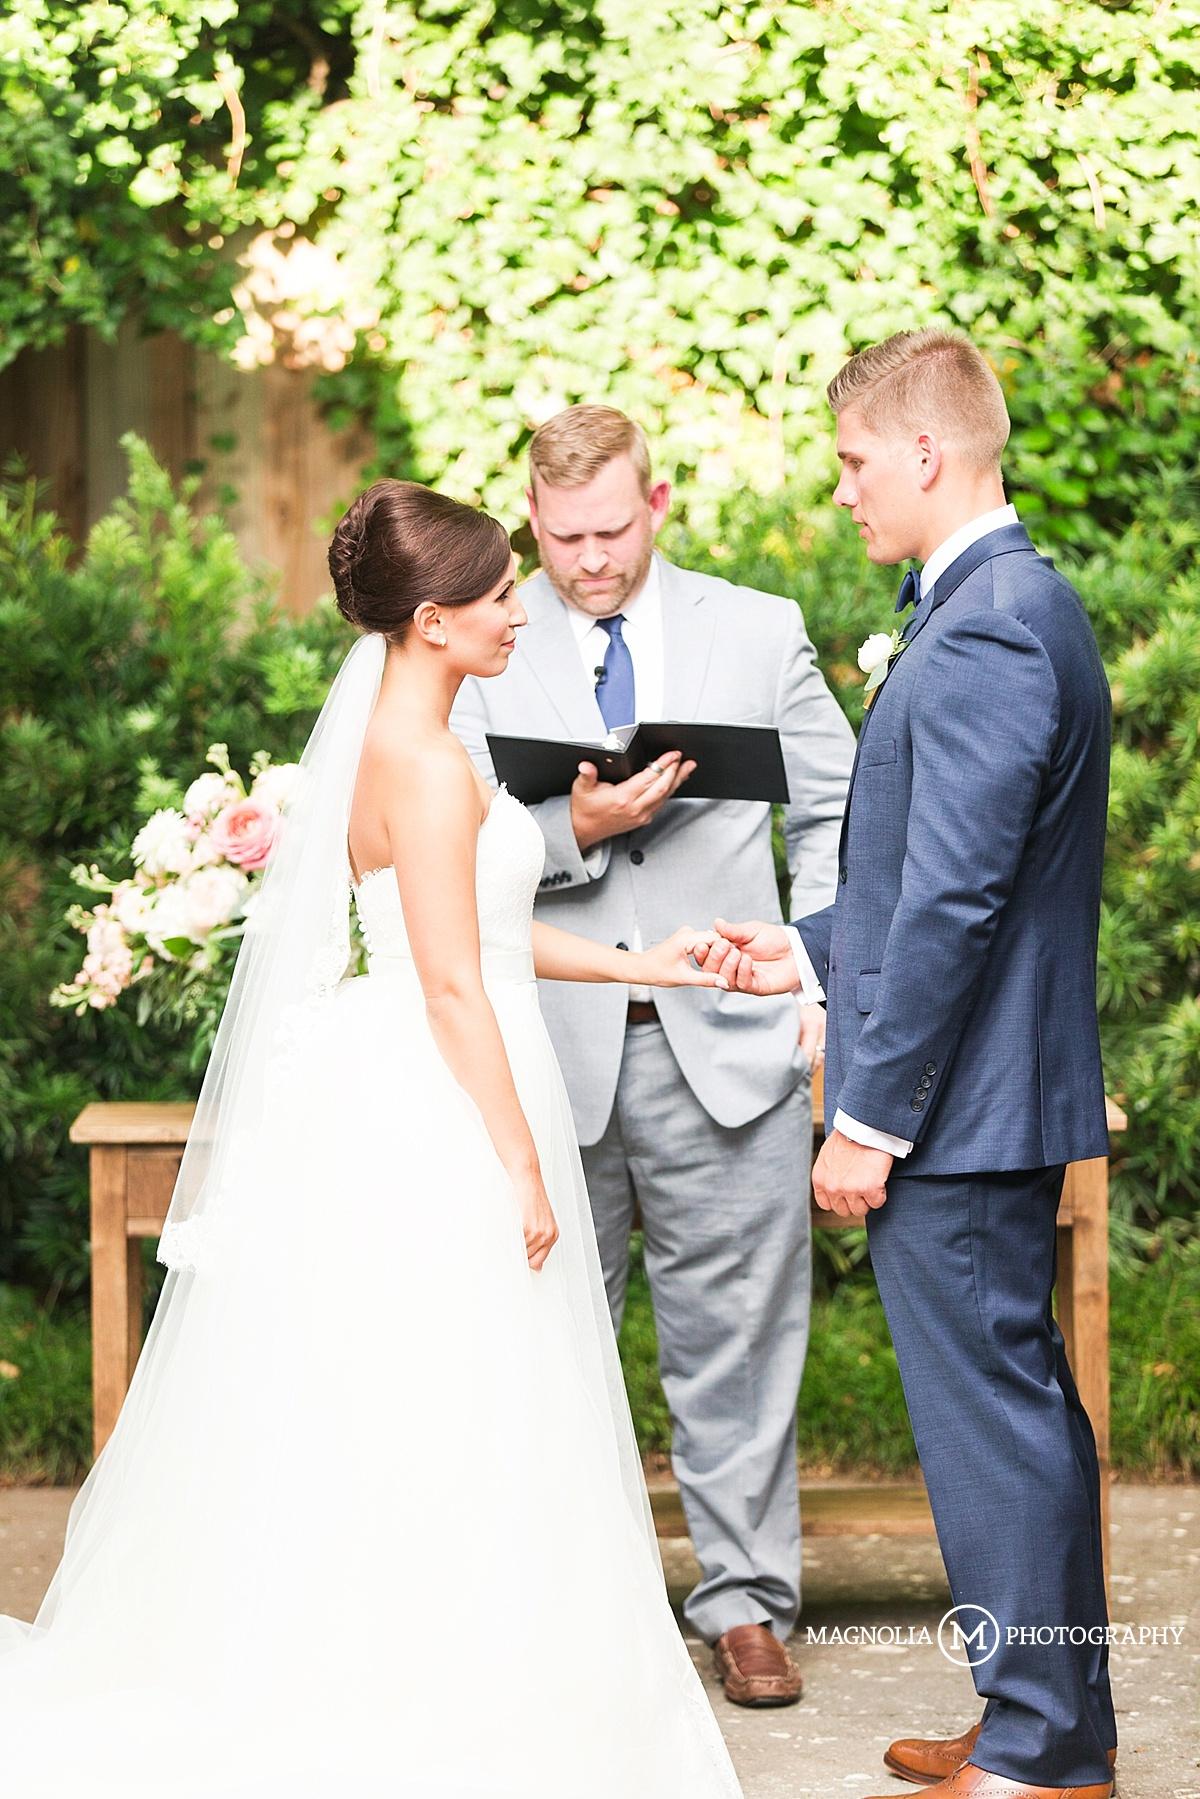 weddings at brooklyn arts center-34-1